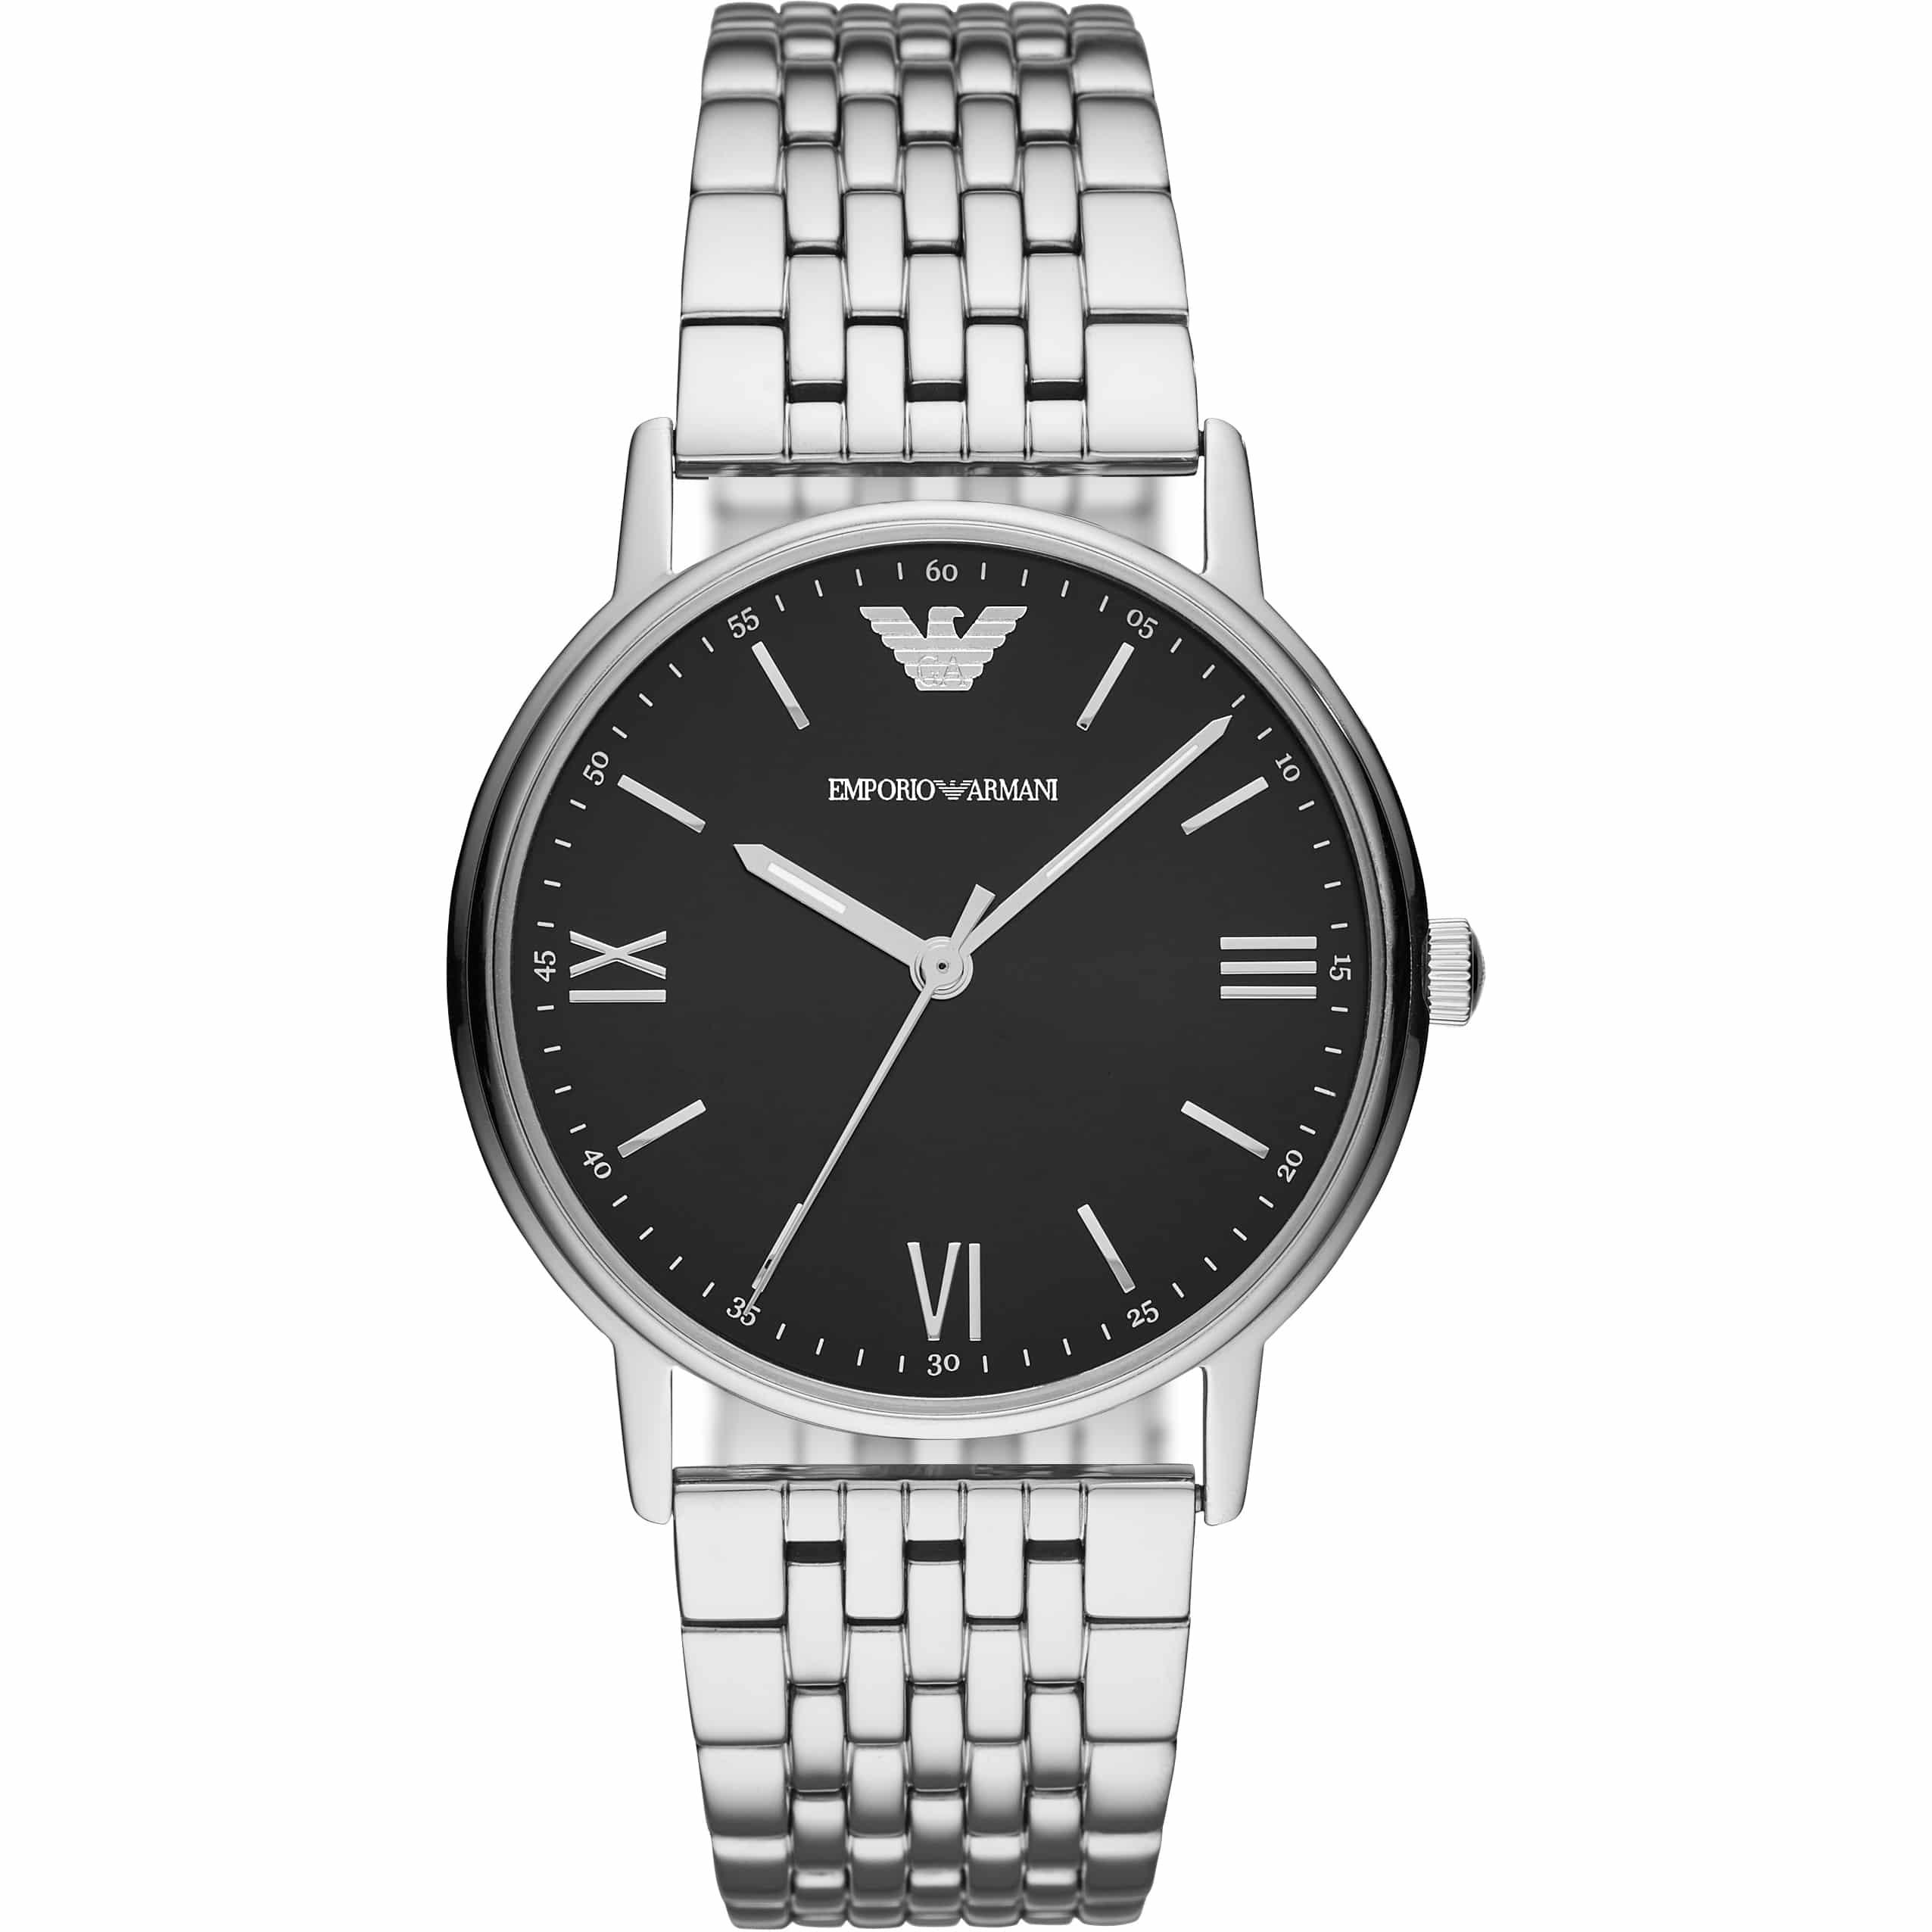 Emporio Armani Kappa Men s Watch Silver AR11152 - Sunlab Malta b18d85740d